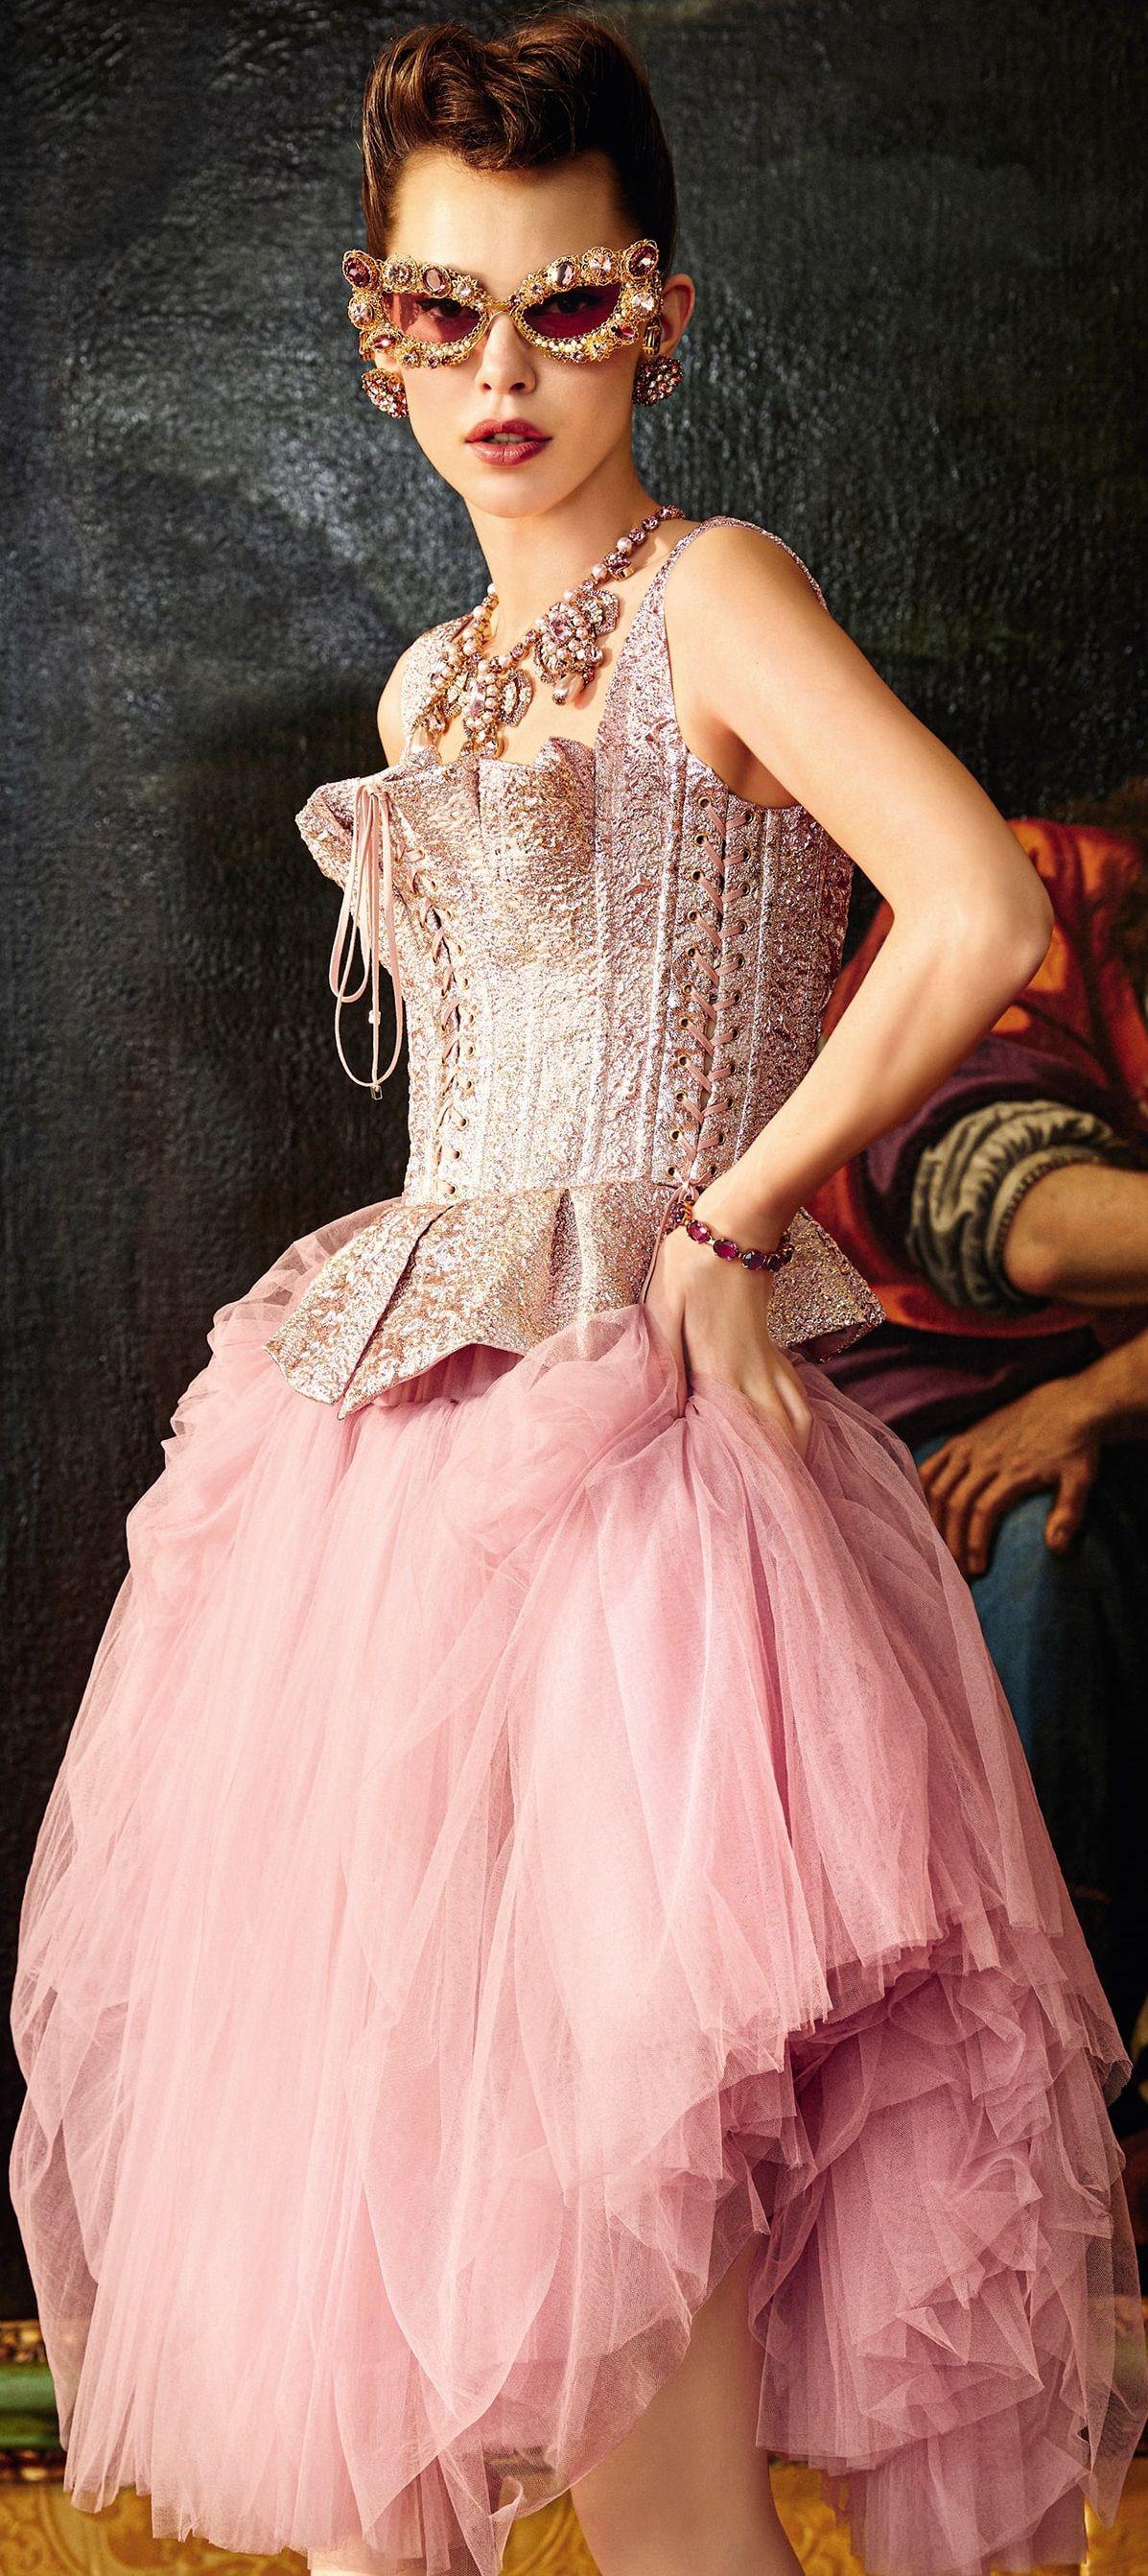 Dolce And Gabbana -Spring 2020 -Love Christmas Pin on 2 Dolce & Gabbana